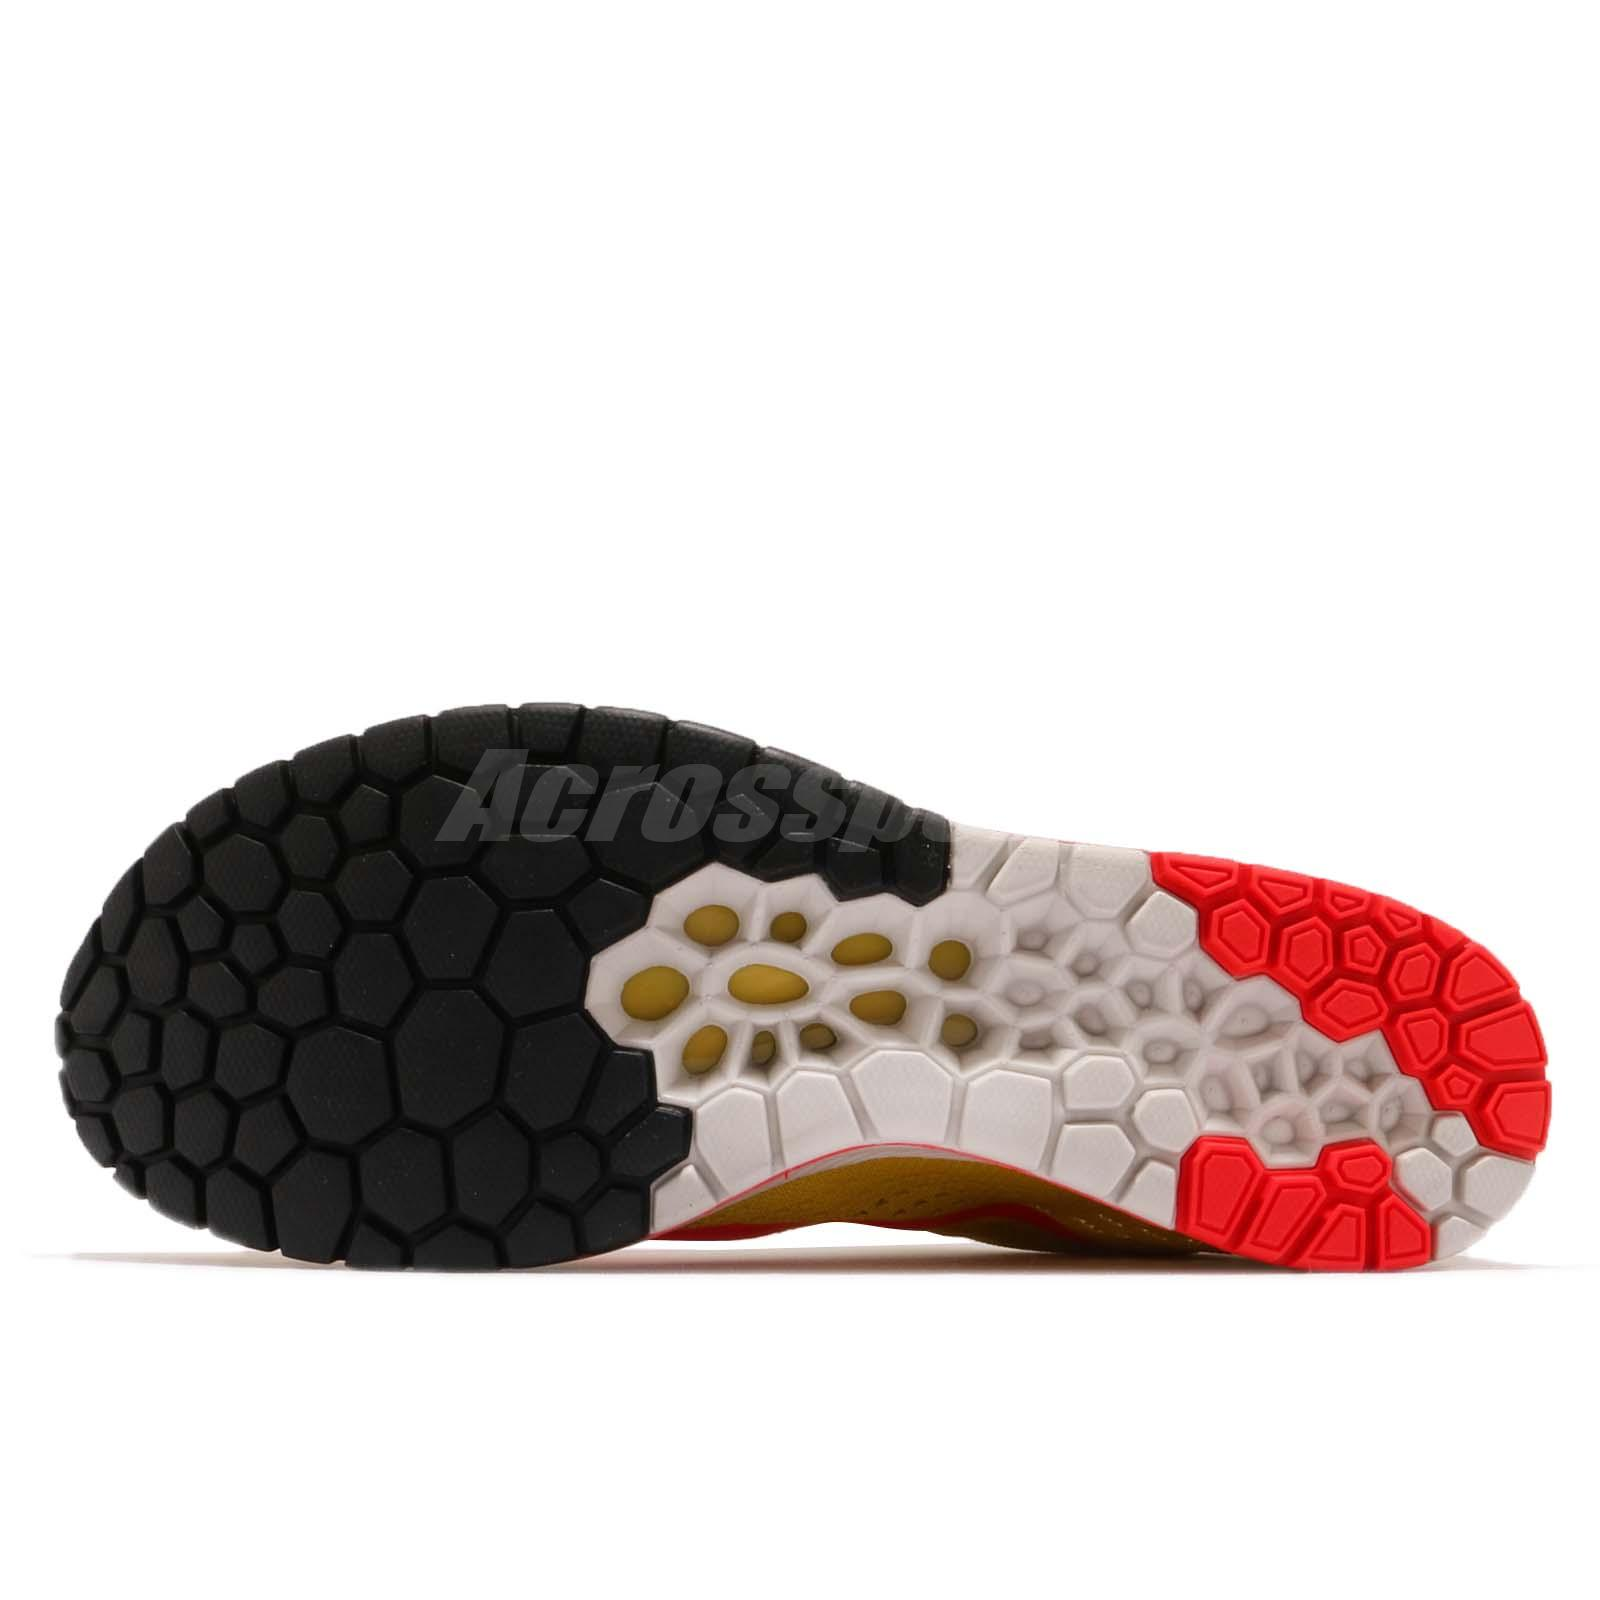 detailed look b8a2c 08e1a Nike Zoom Streak 6 VI Bright Citron Crimson Men Running Shoes ...